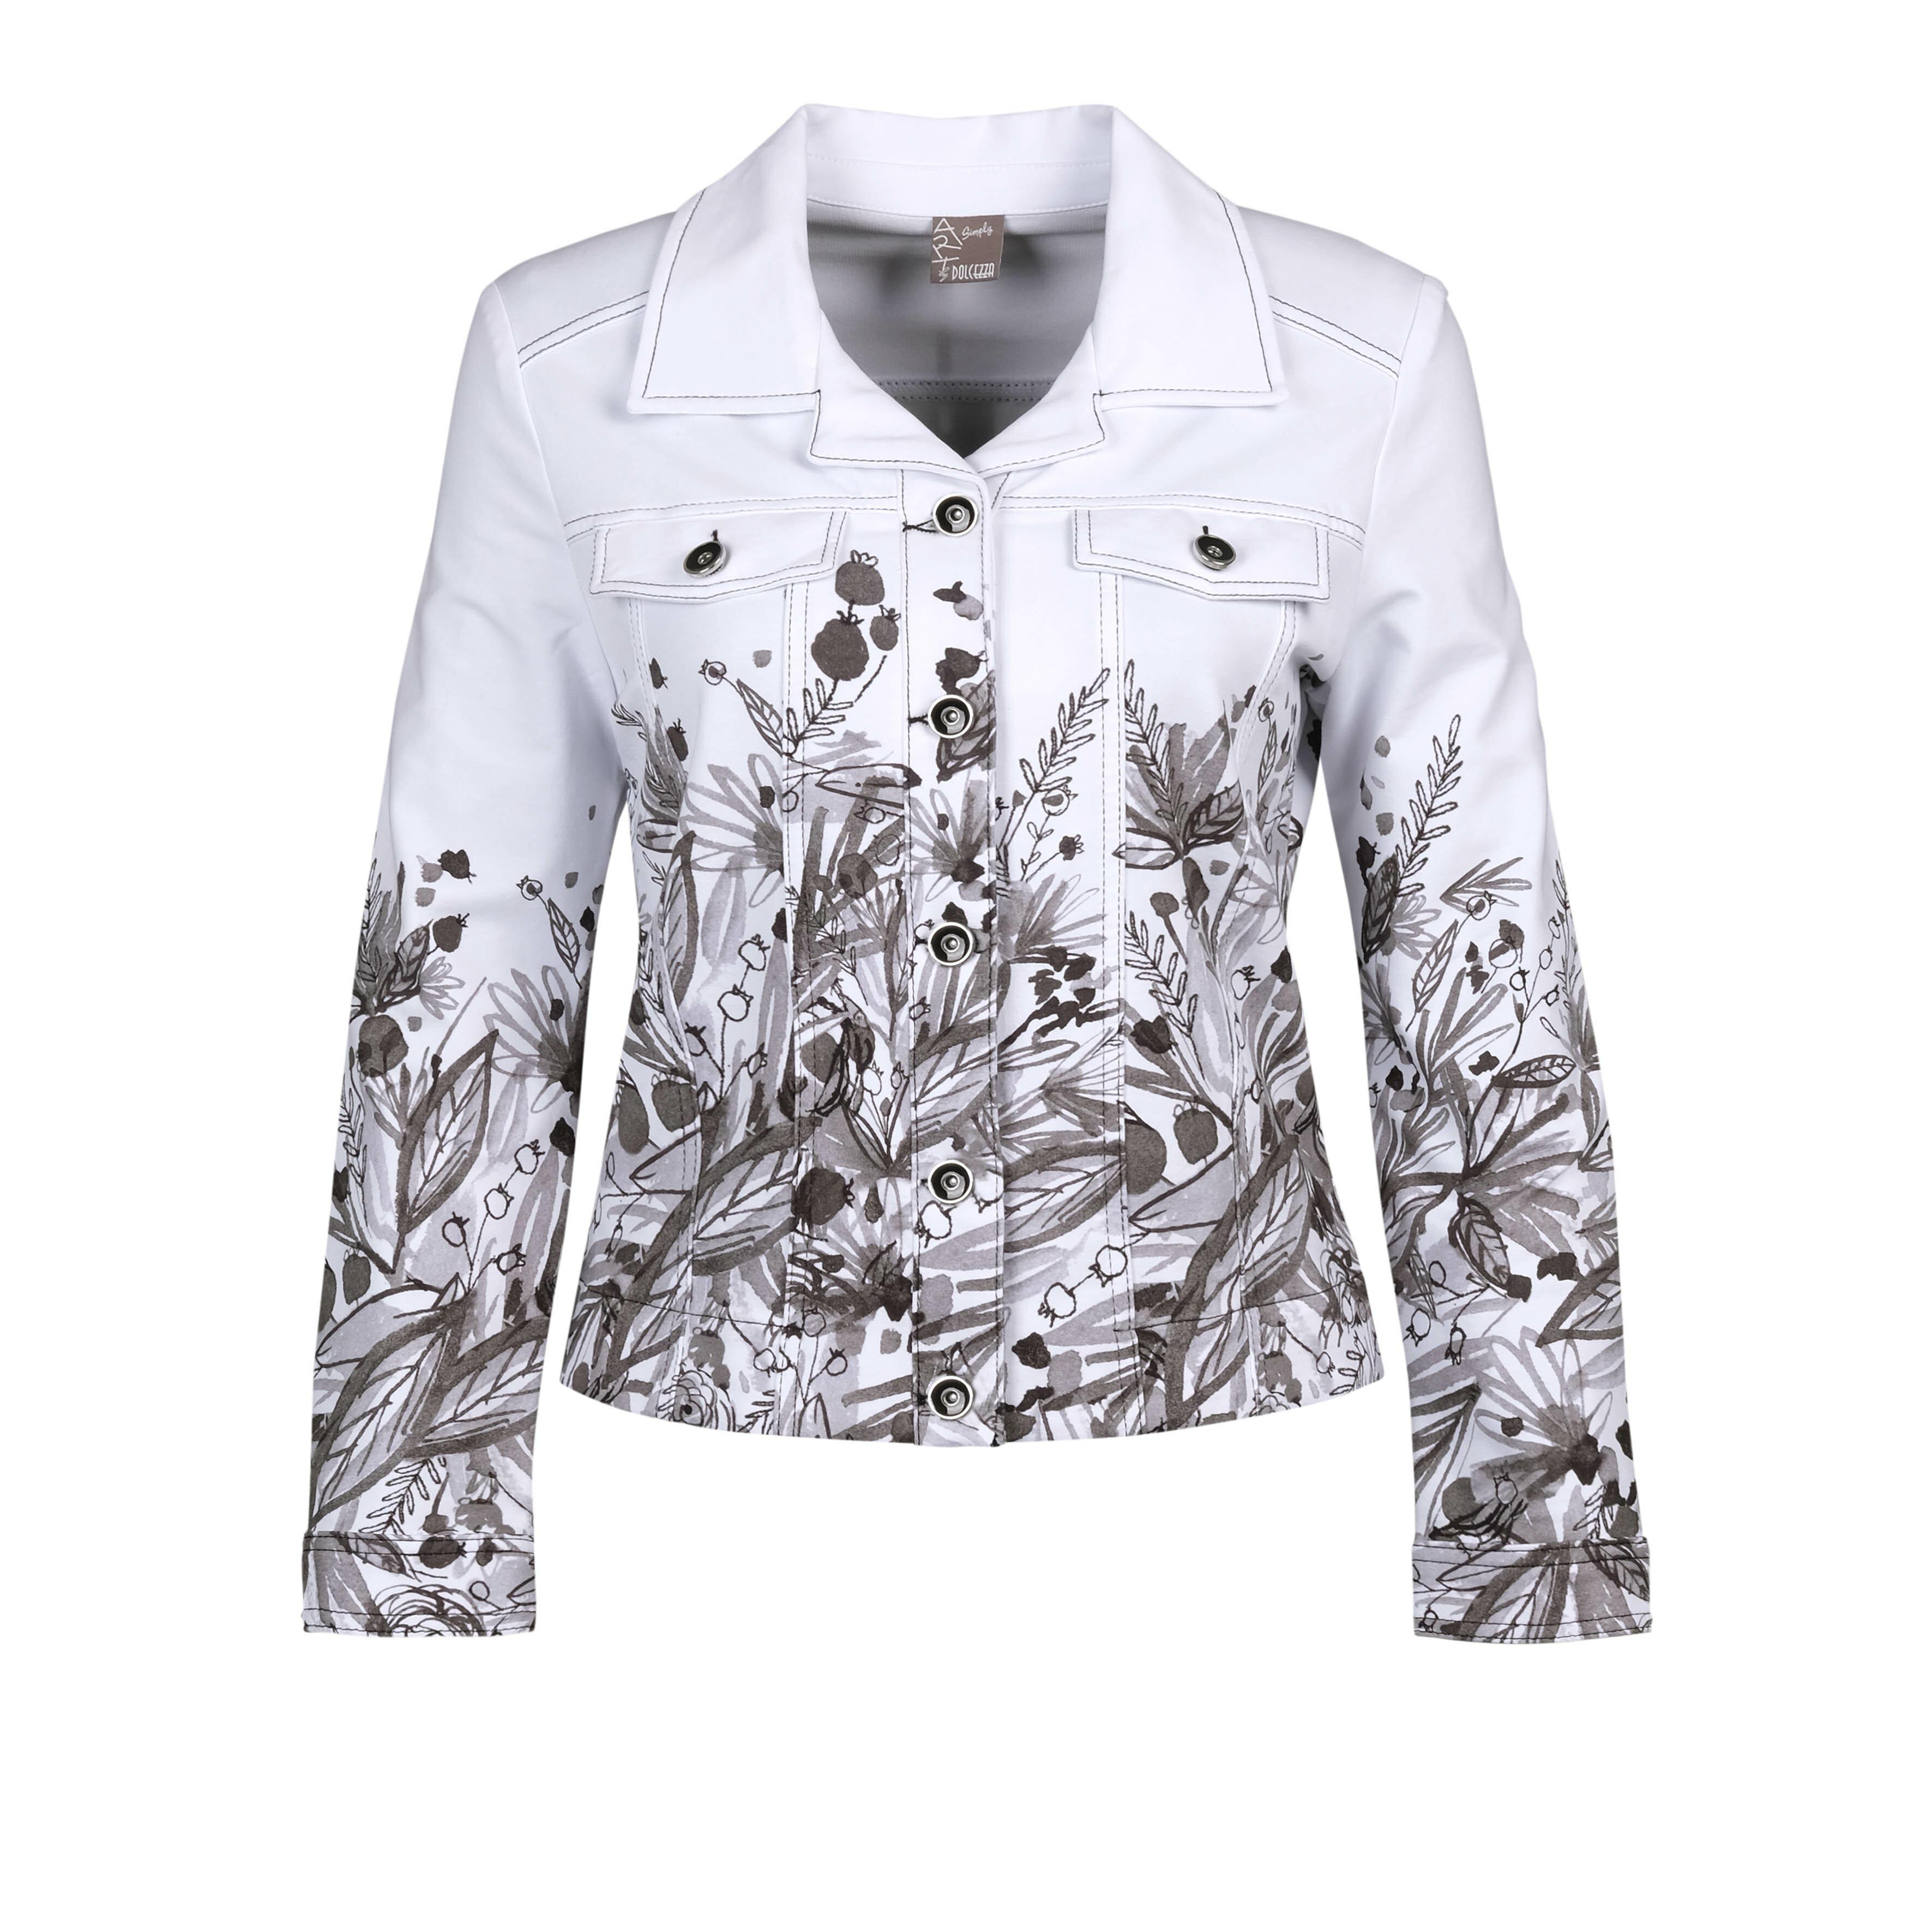 Simply Art Dolcezza: Wild Flowers In Black & White Abstract Art Soft Denim Jacket (2 Left!)